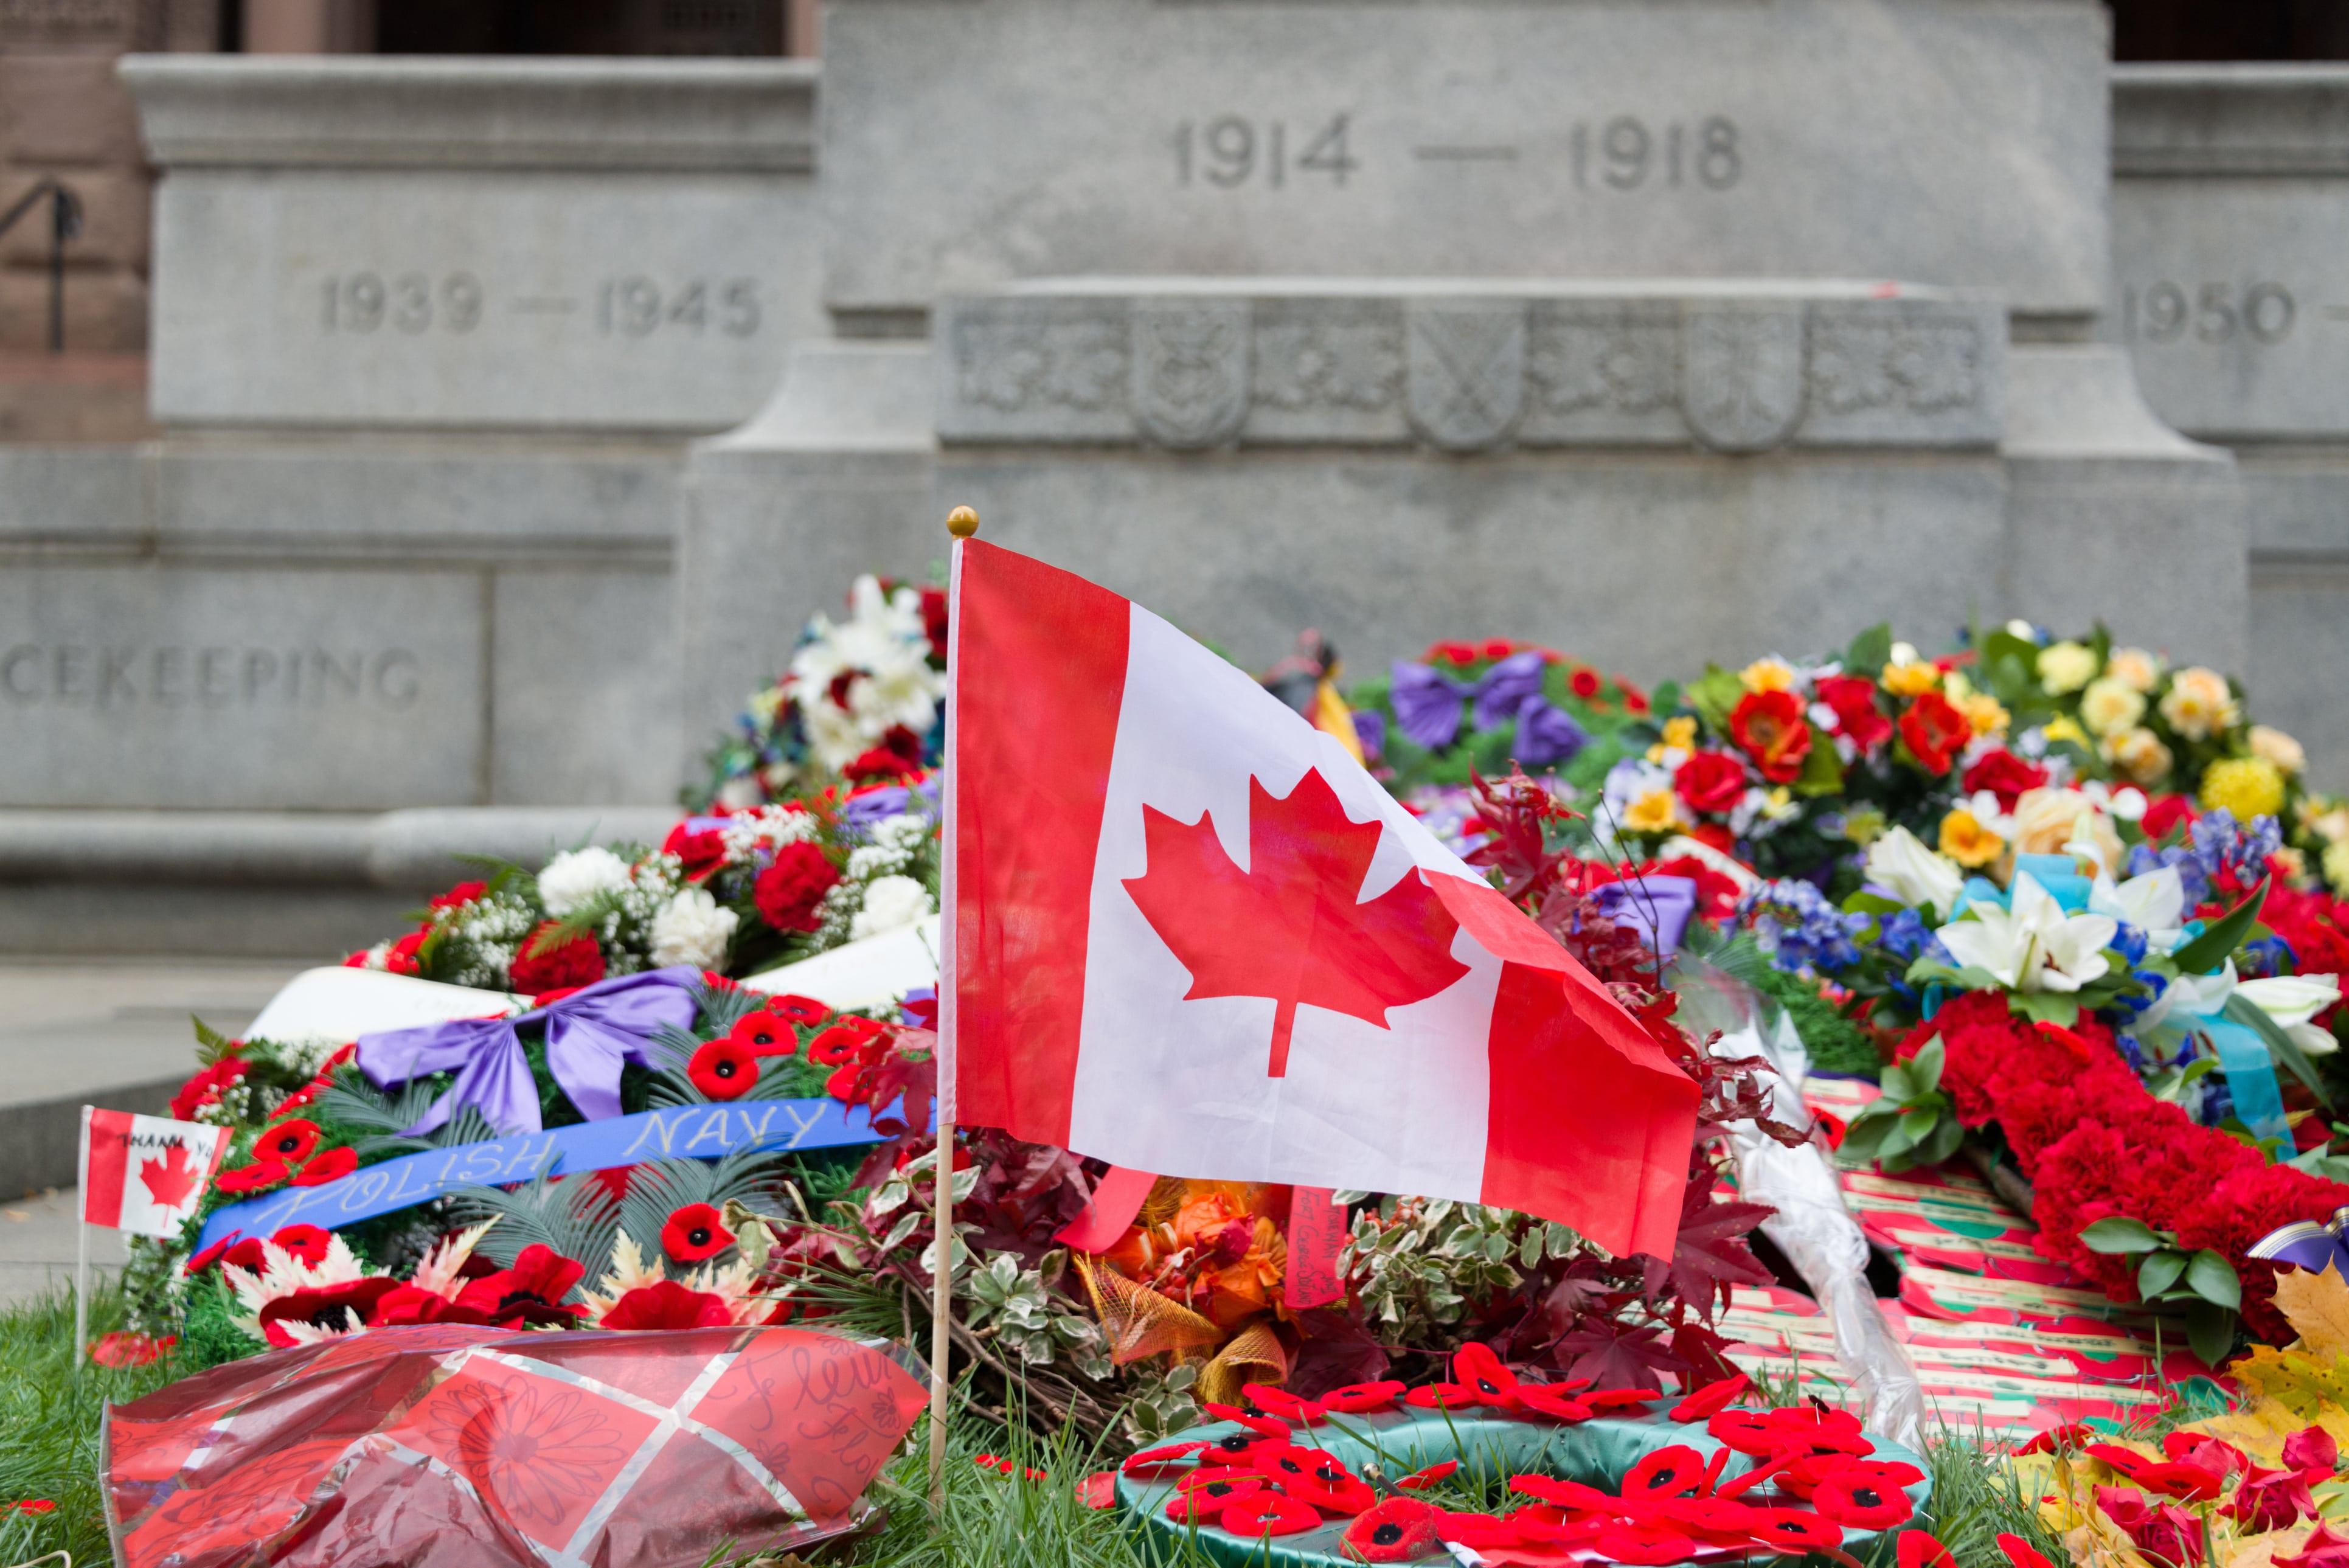 Canadian flag laid amongst wreaths